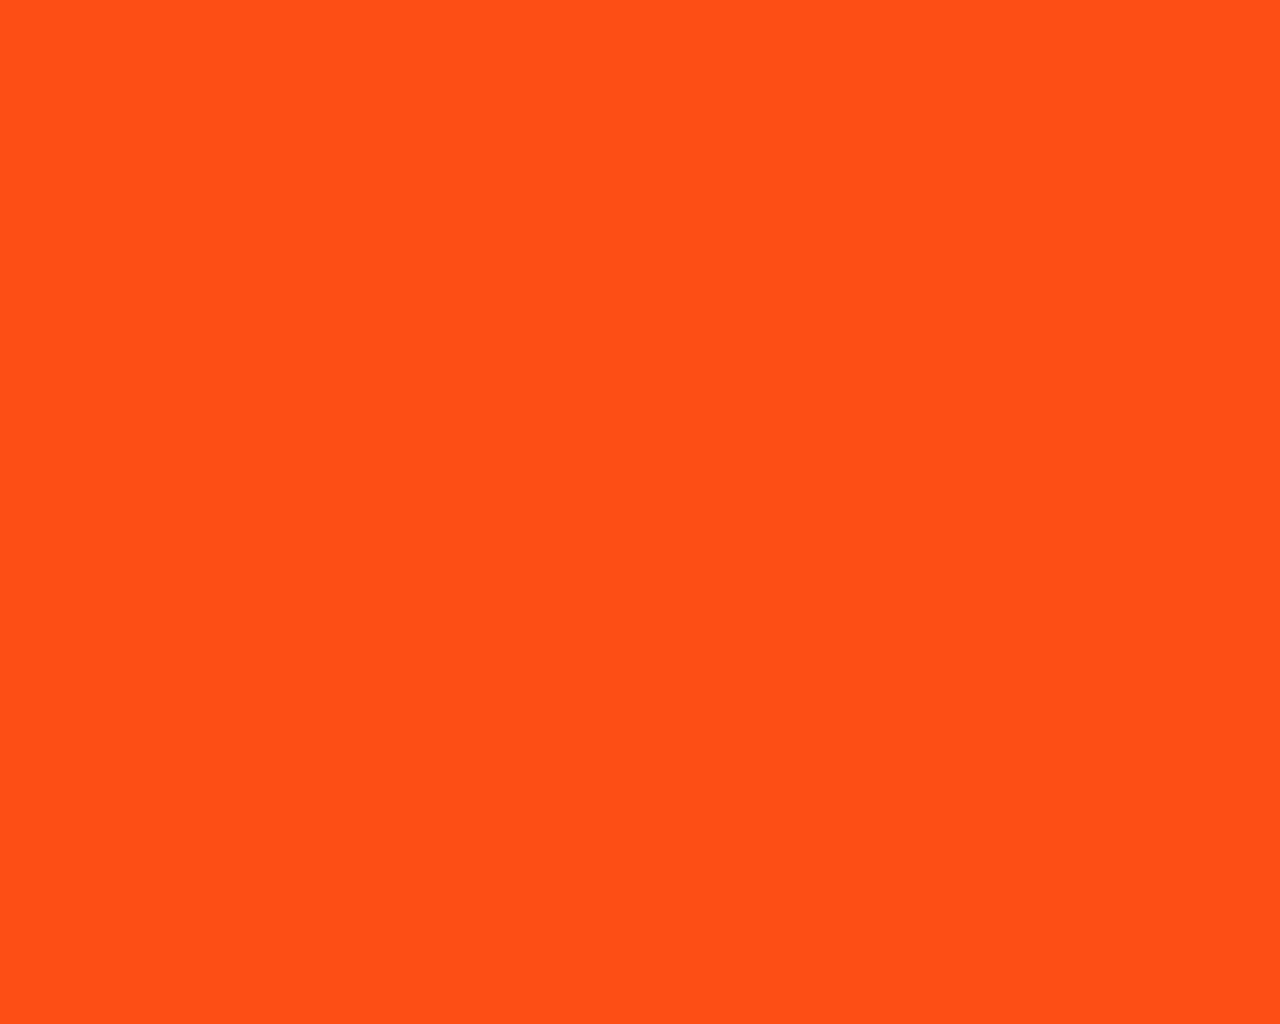 1280x1024 Orioles Orange Solid Color Background